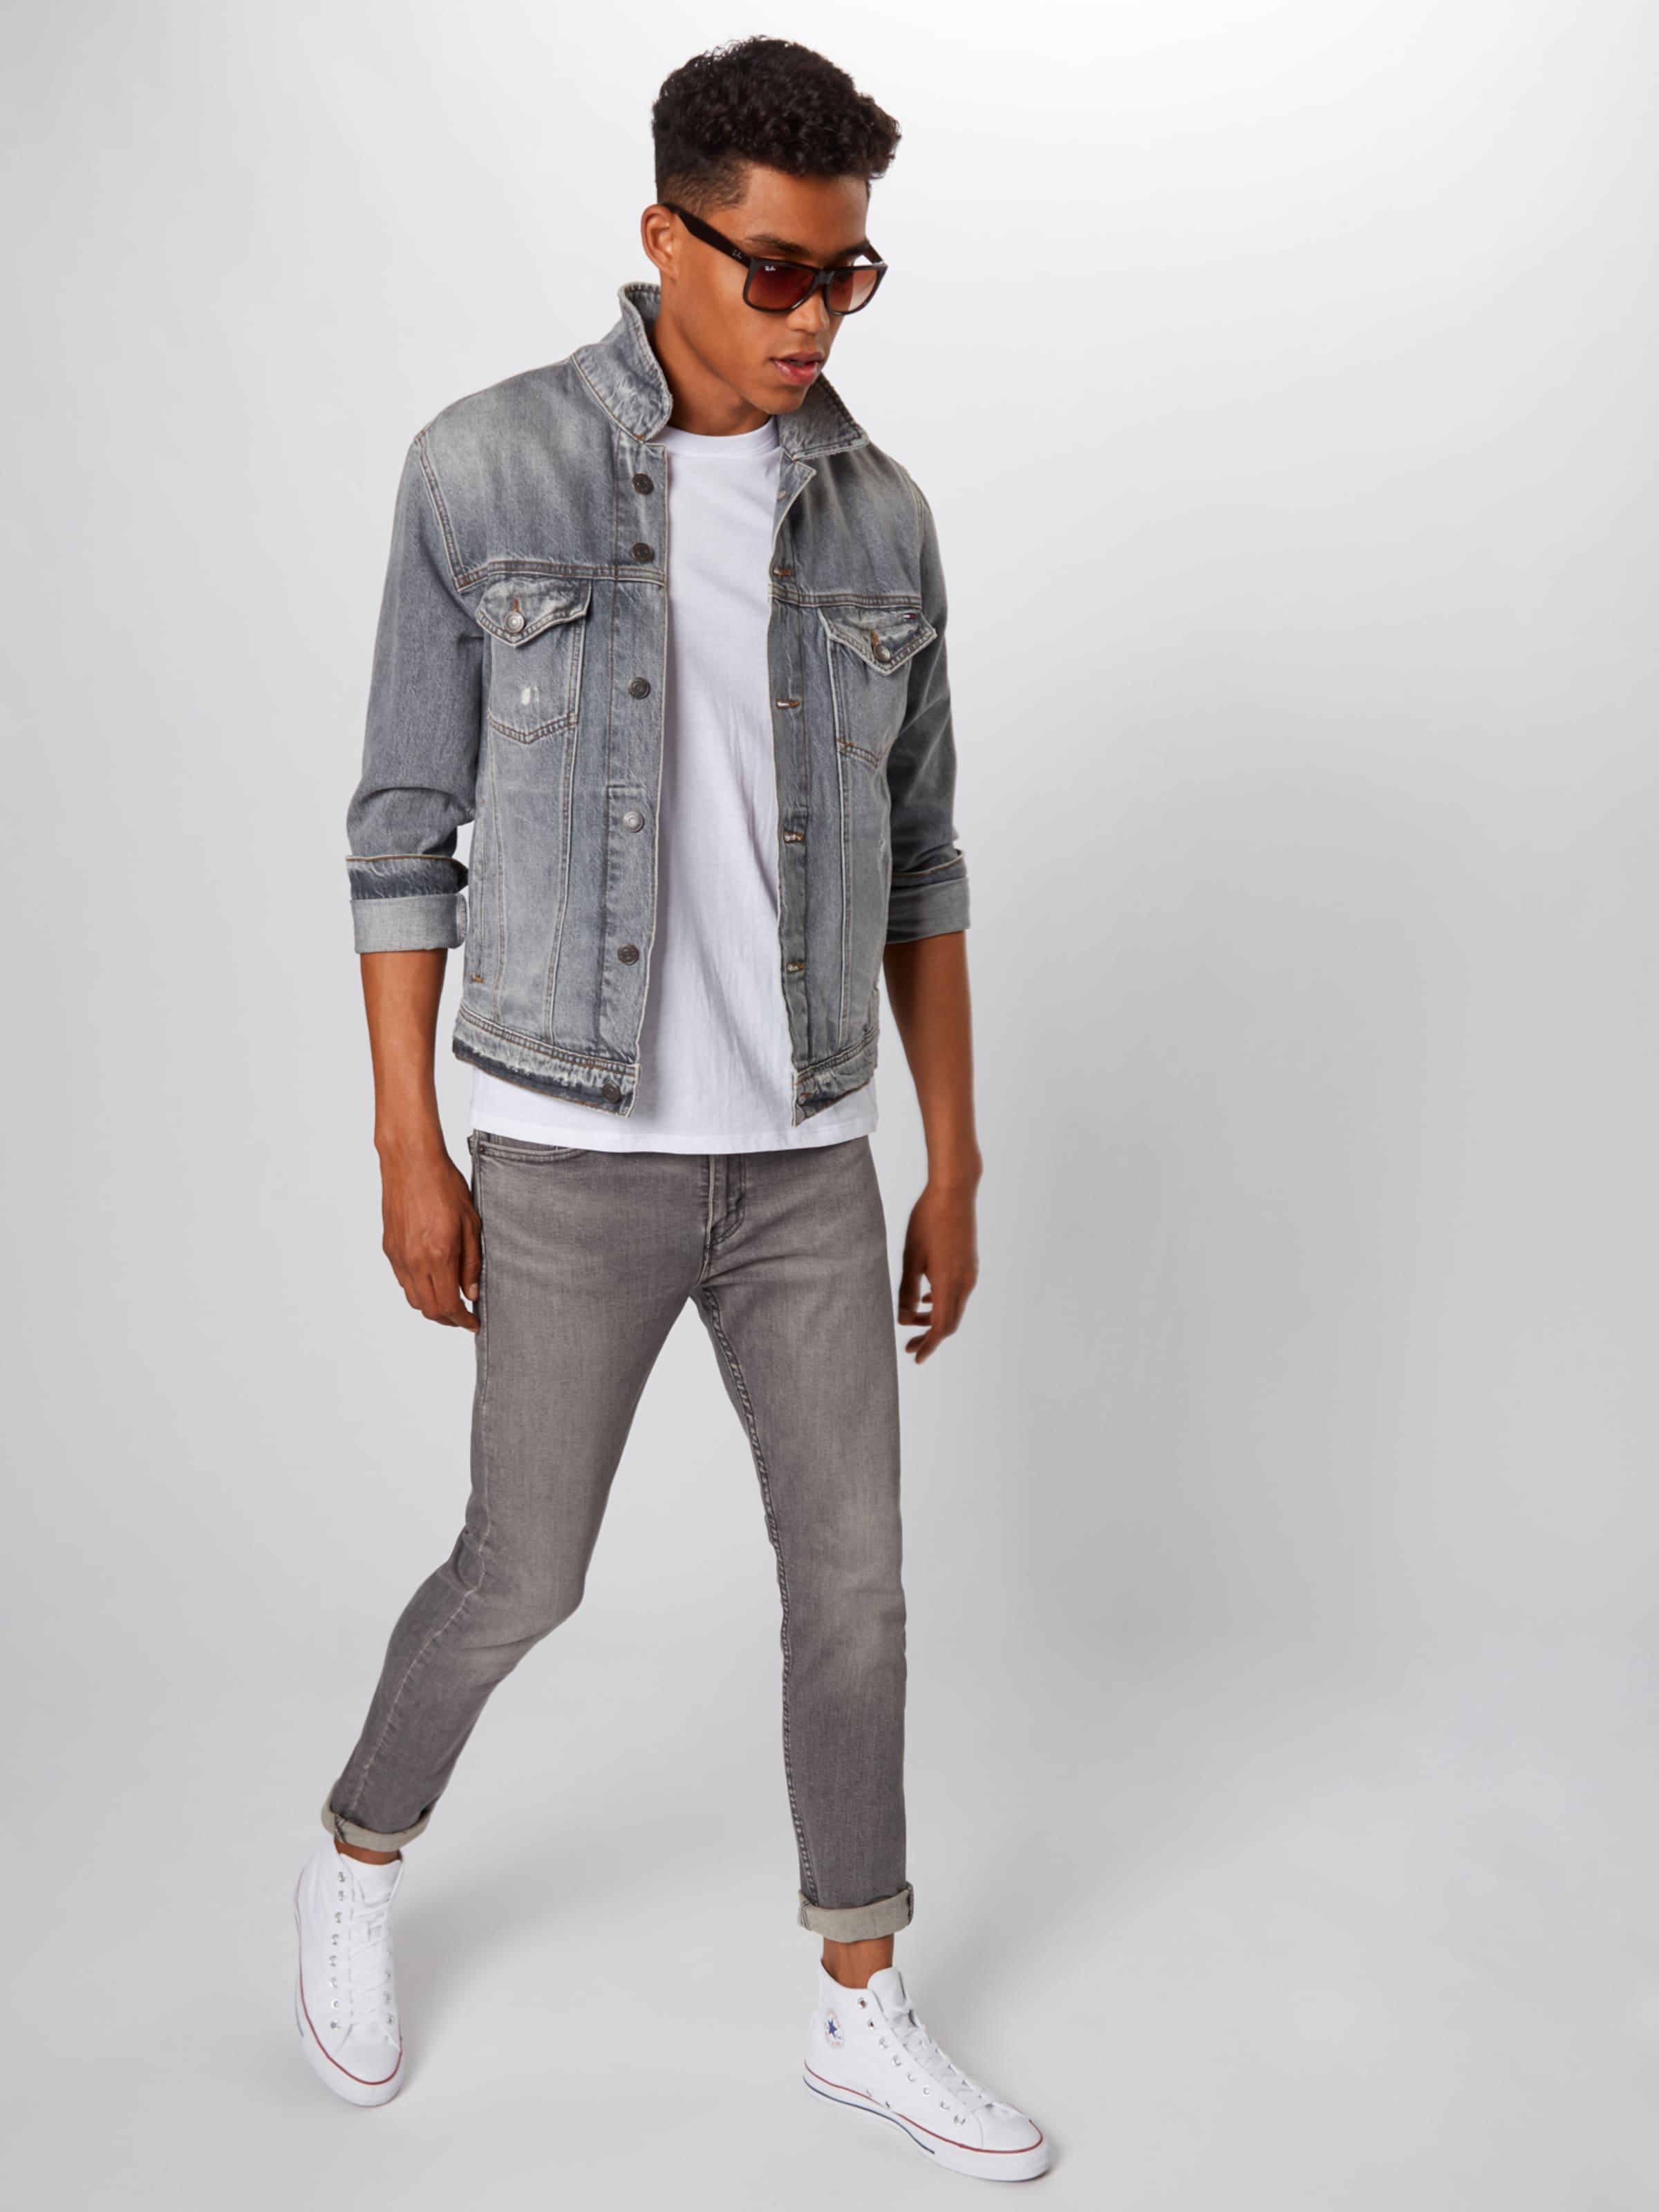 In In Grau Levi's Jeans Levi's Grau Jeans kXiOZuPT